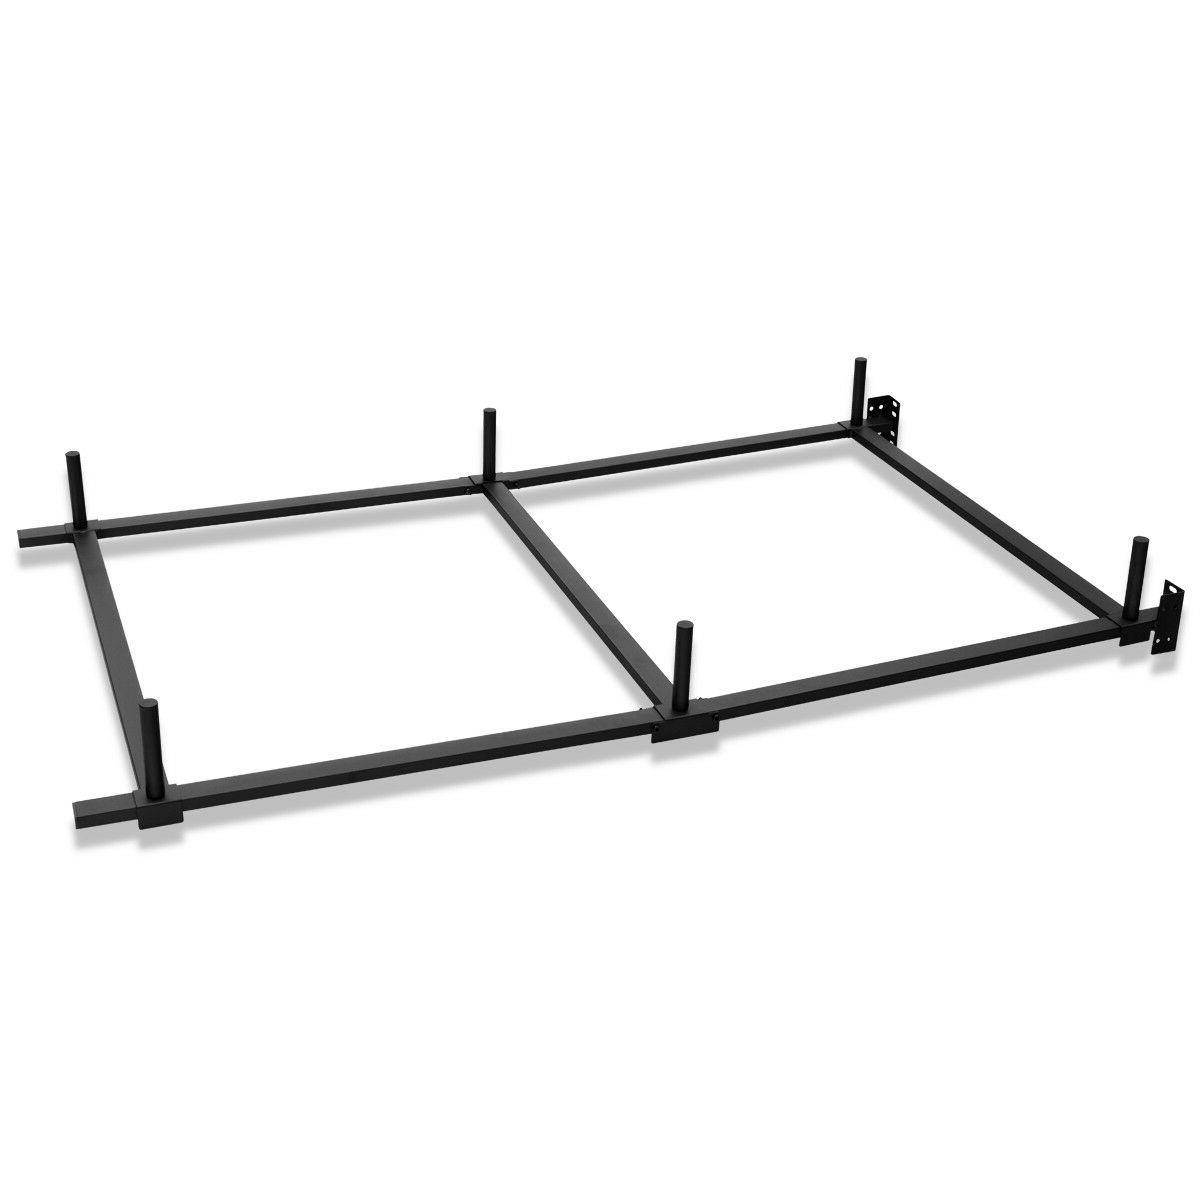 Black Folding Duty Metal Support Size